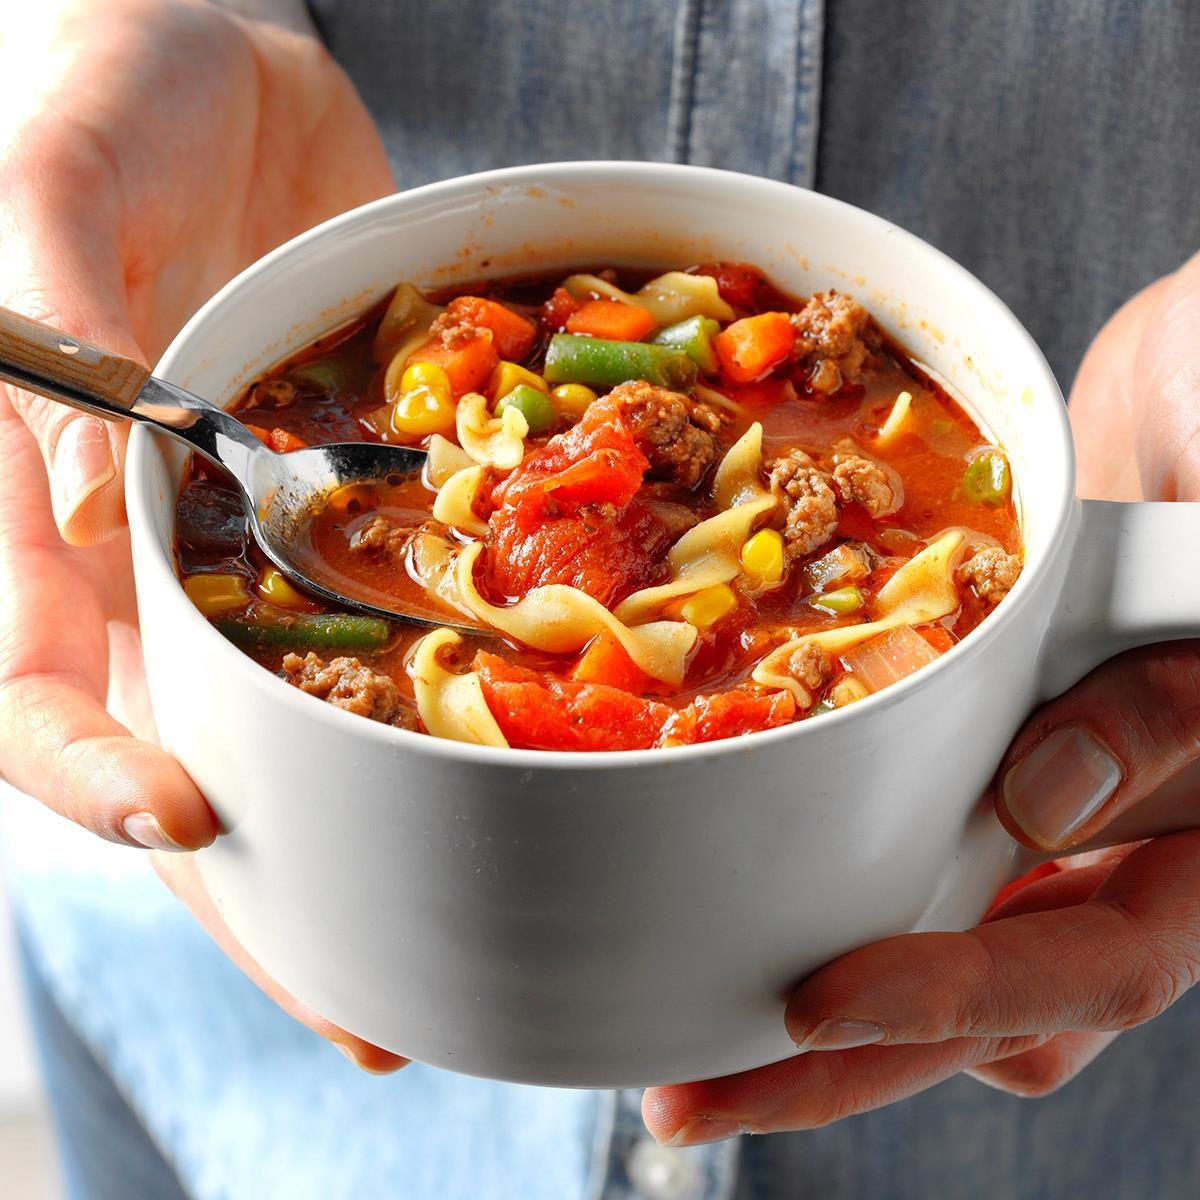 Washington: Beef Noodle Soup